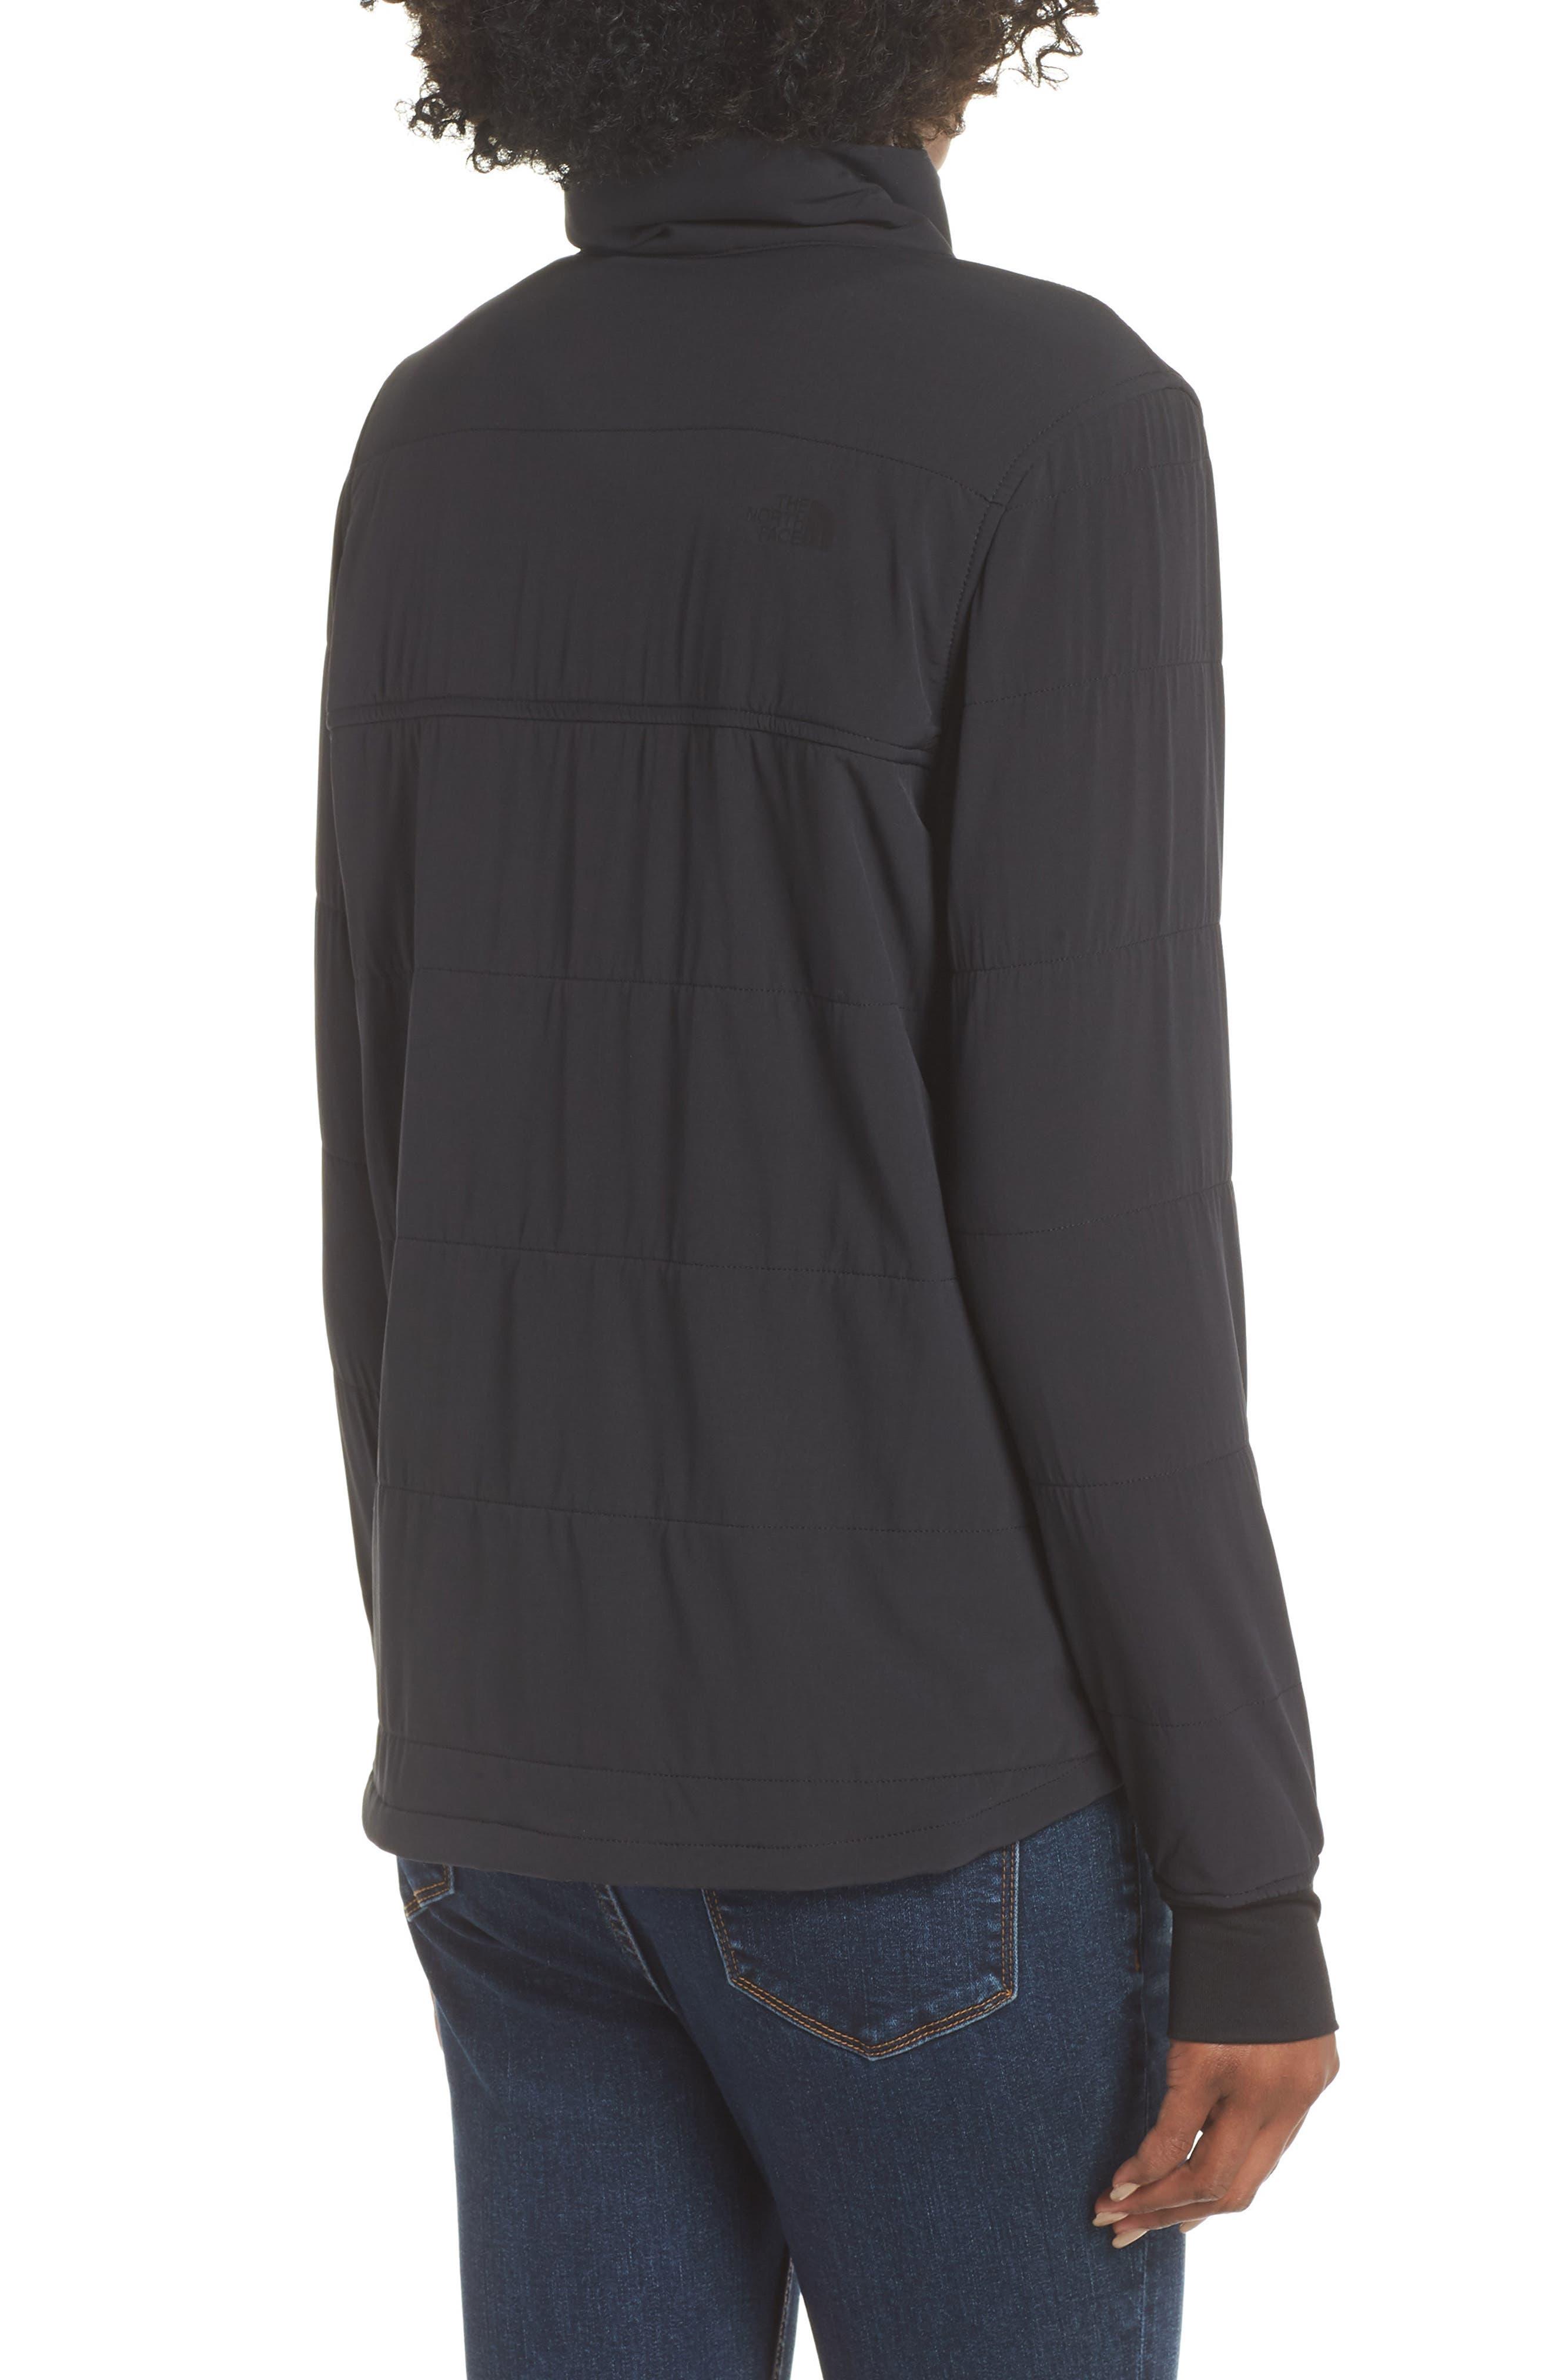 Mountain Snap Neck Sweatshirt,                             Alternate thumbnail 2, color,                             001